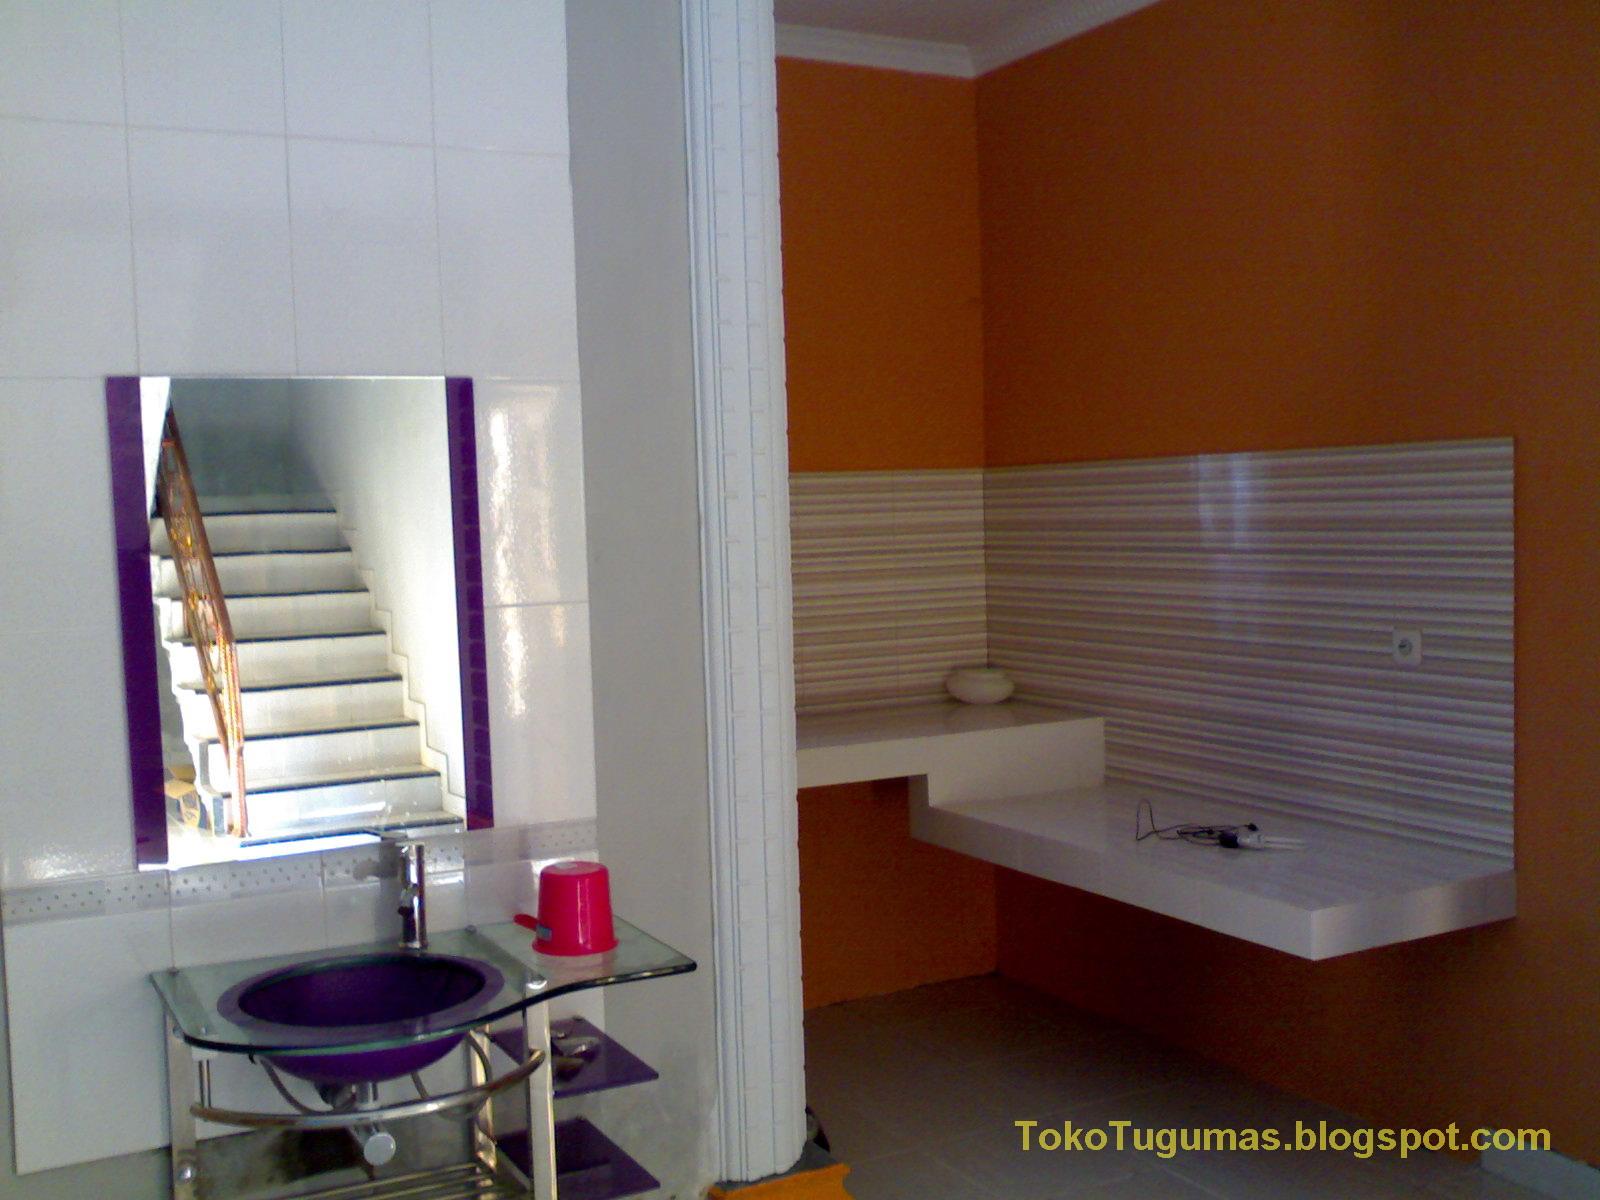 Toko Tugumas | Desain Dapur Minimalis.